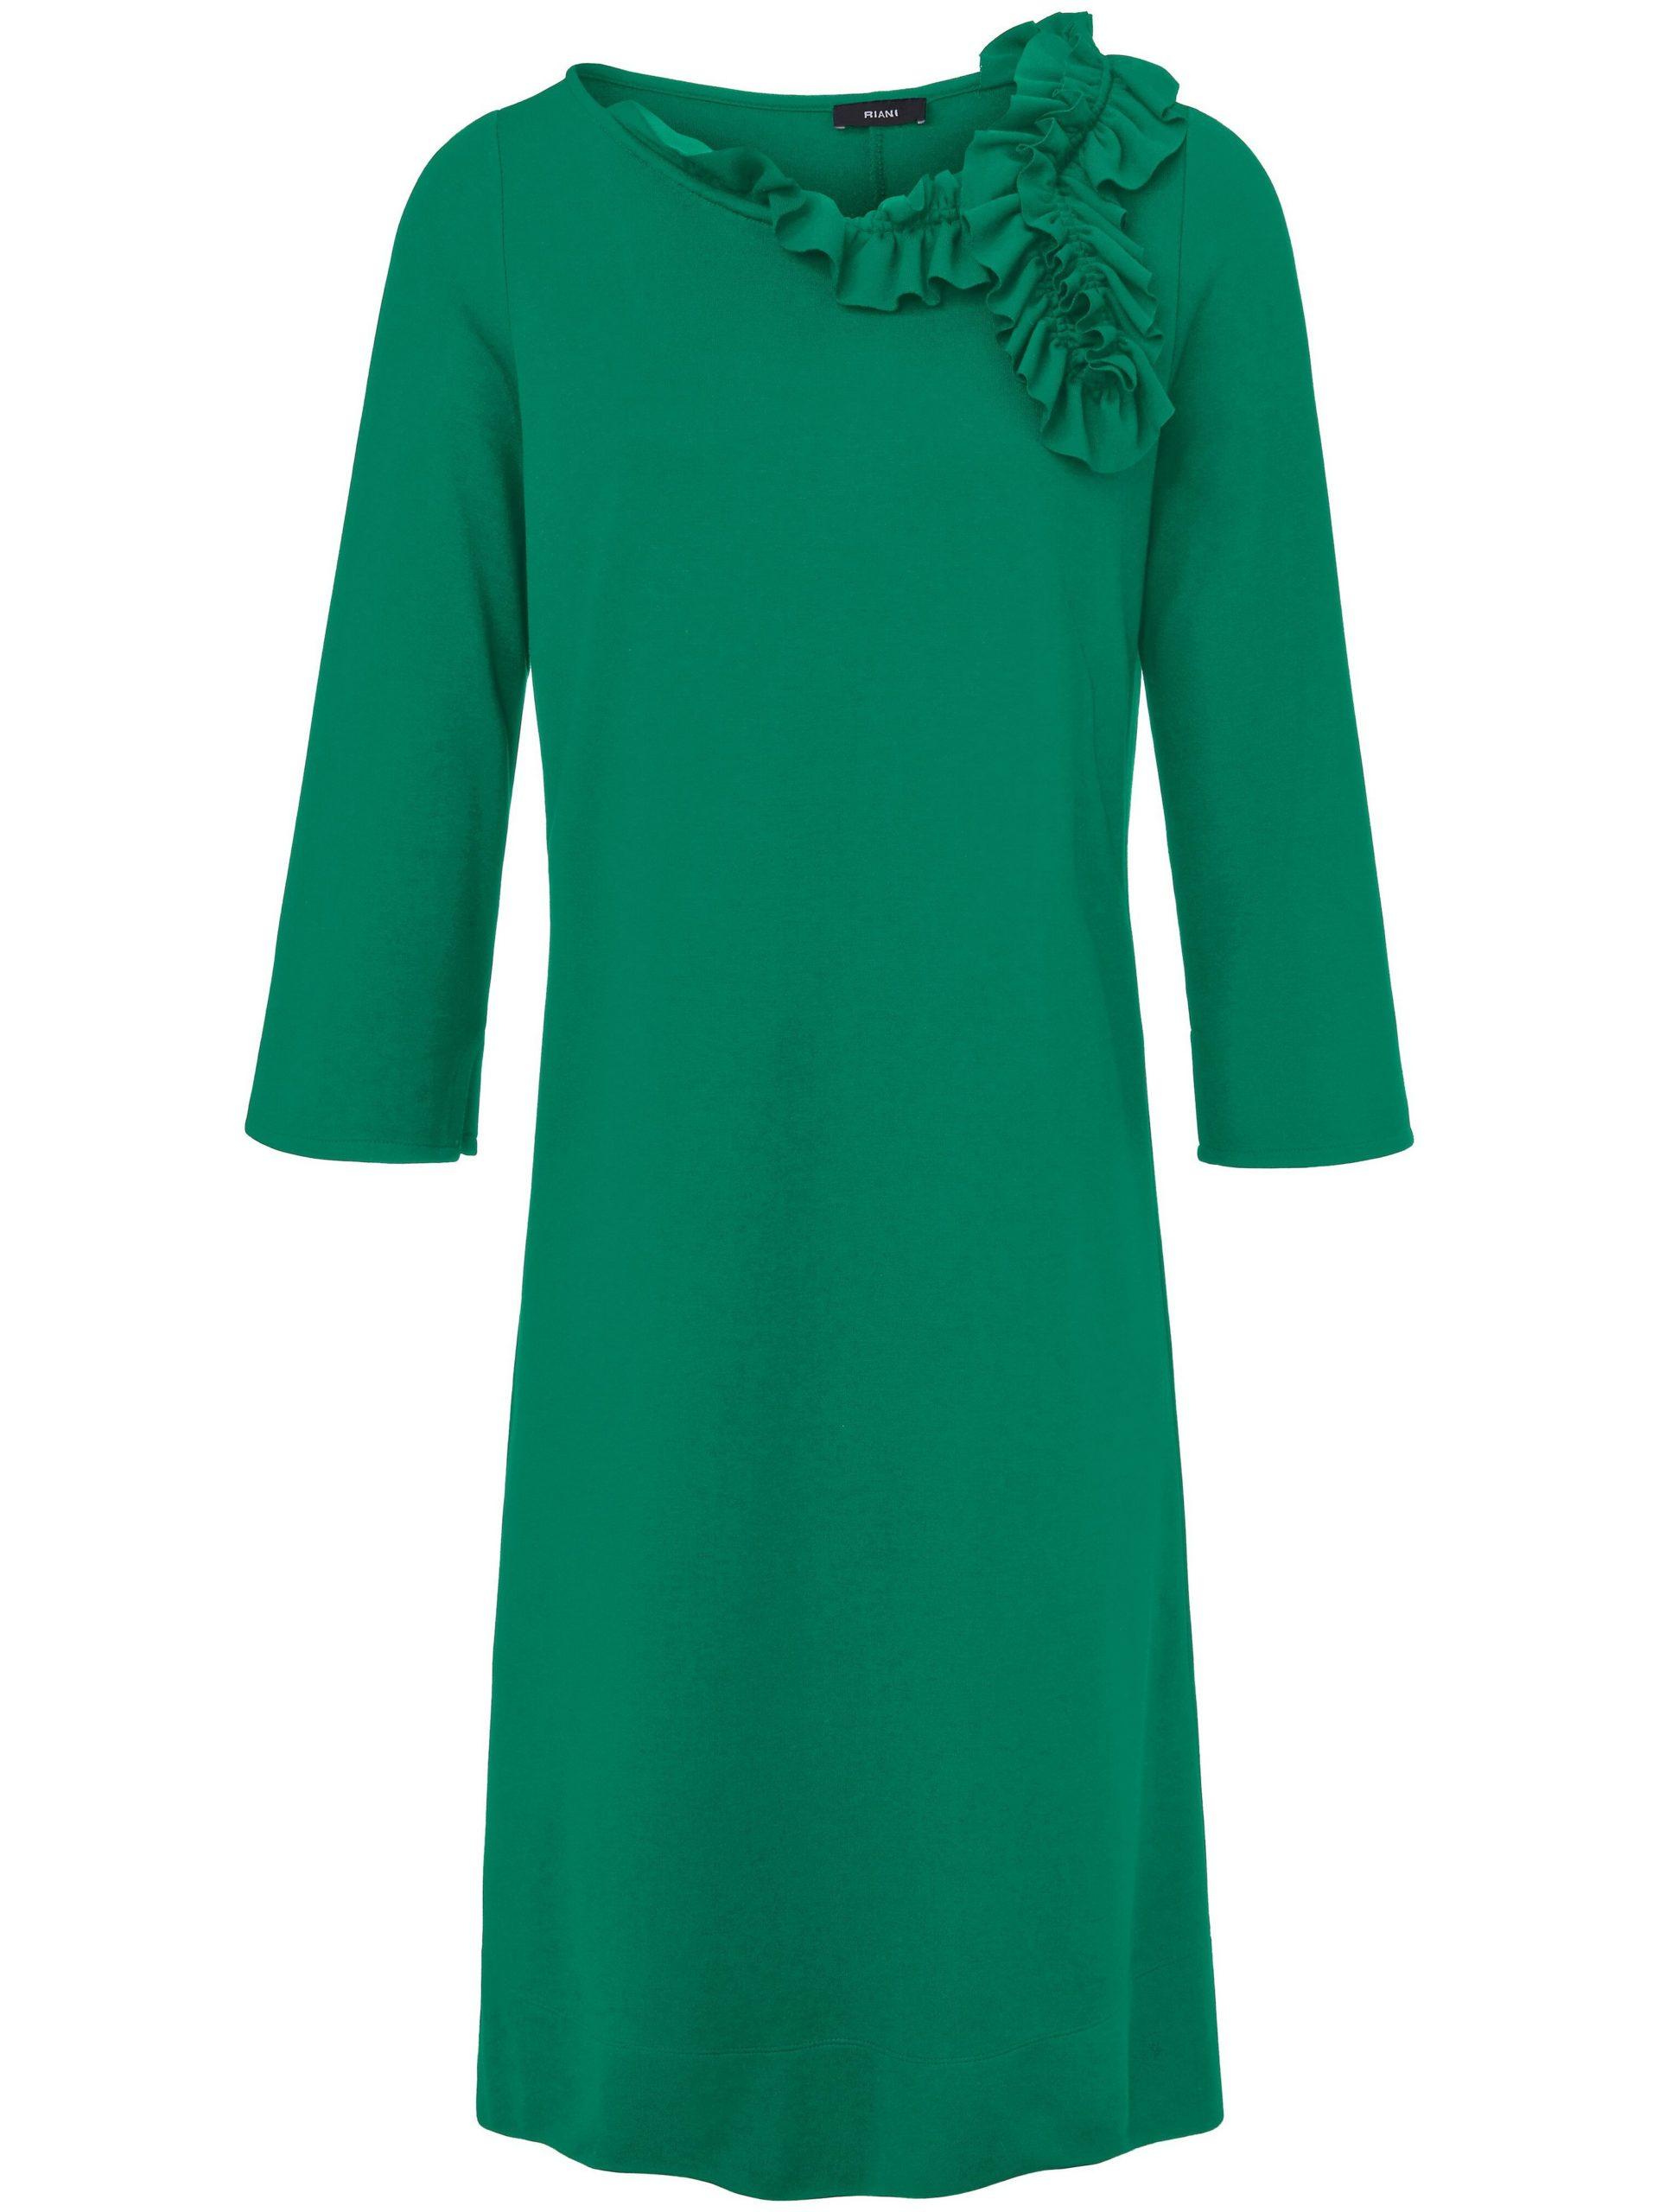 Jerseyjurk Van Riani groen Kopen